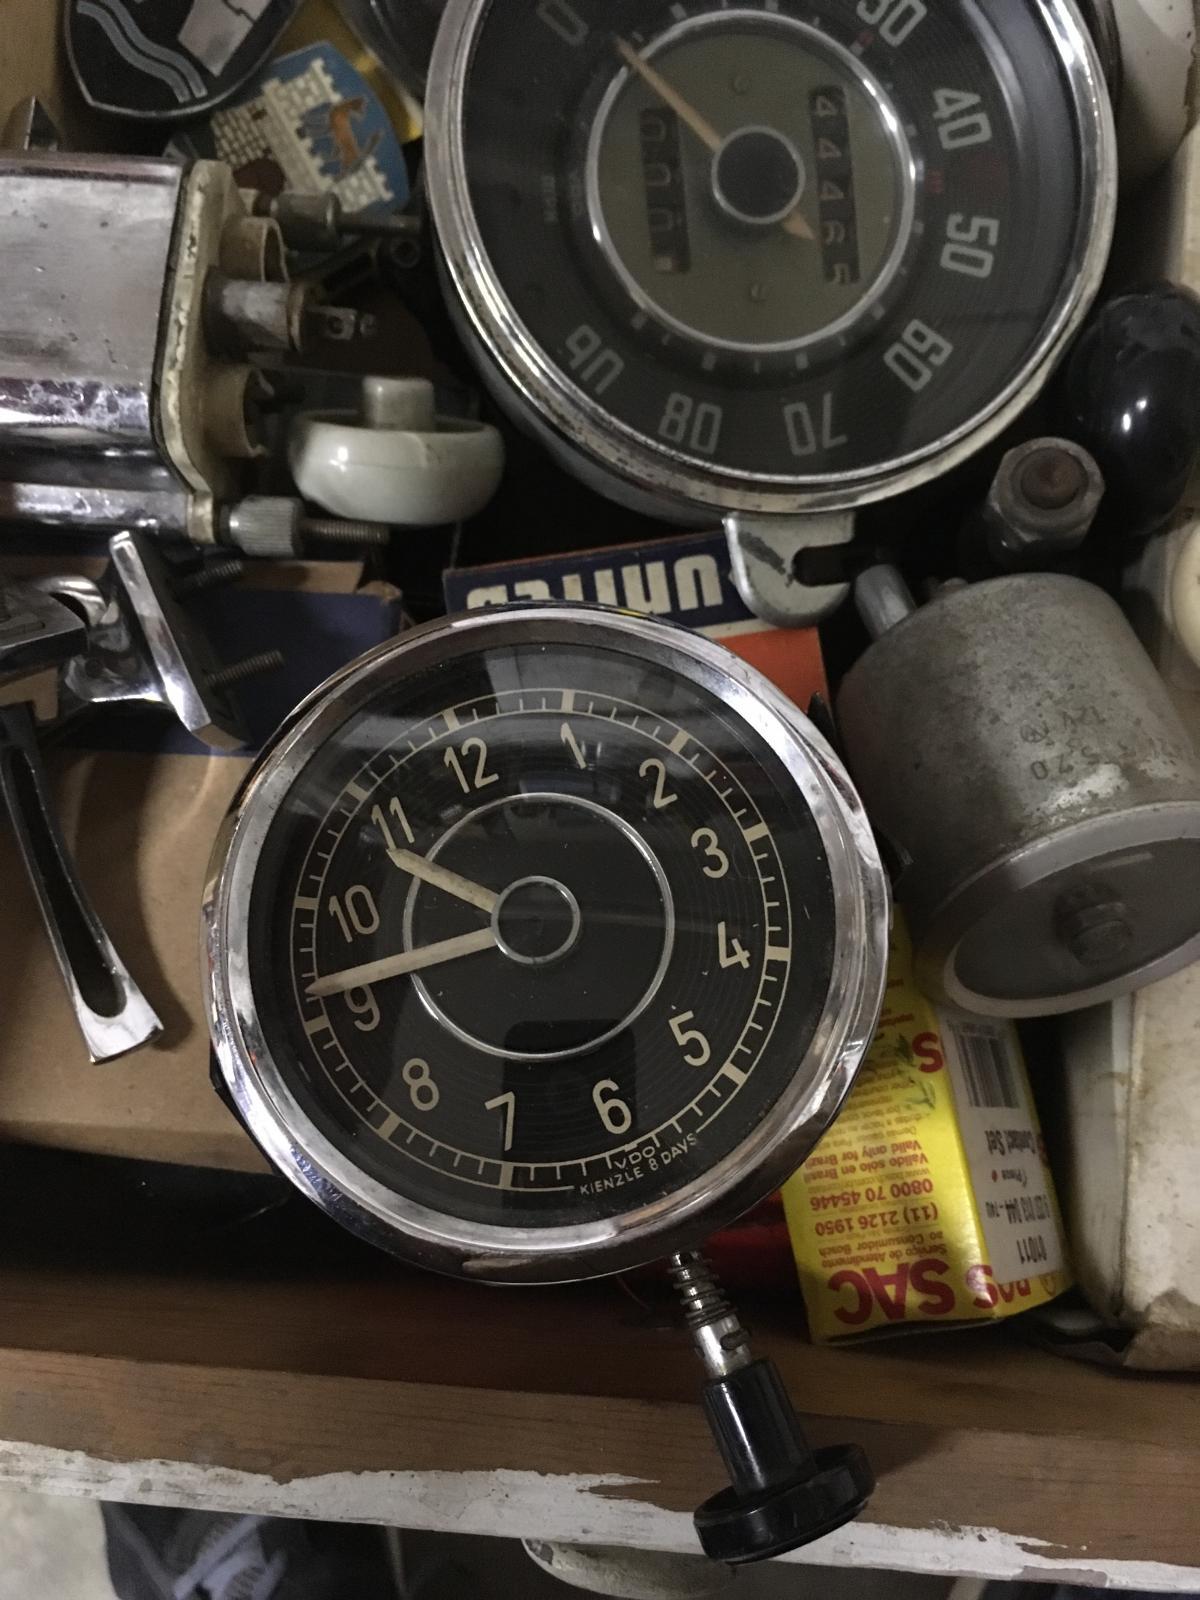 TheSamba.com :: Accessories/Memorabilia/Toys - View topic - VDO ...